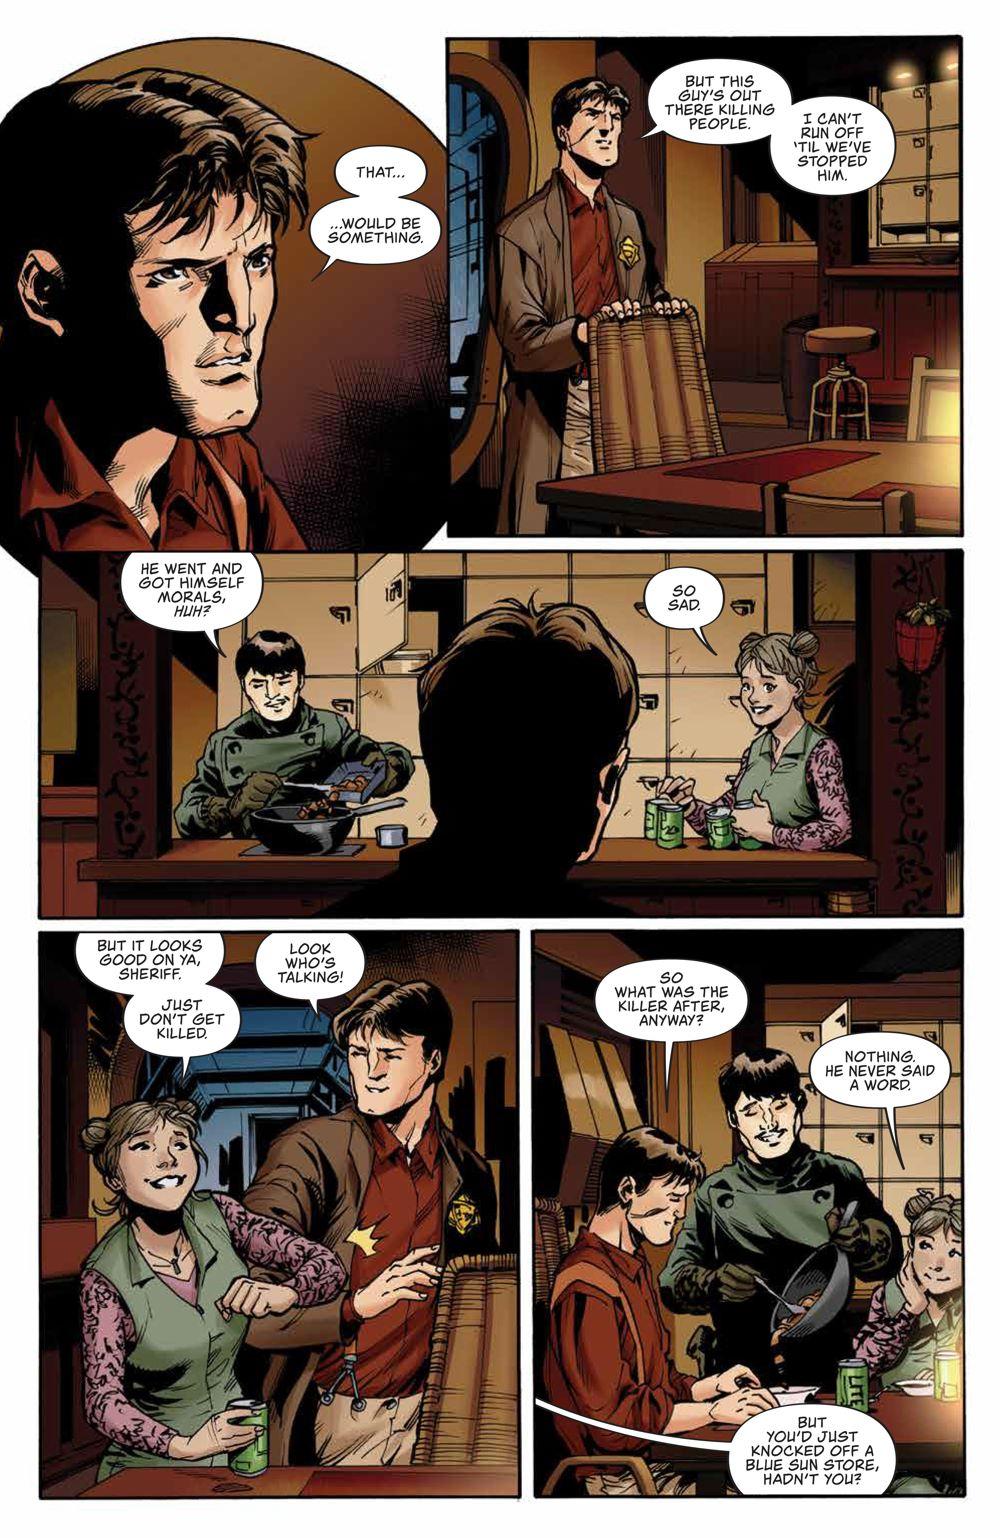 Firefly_NewSheriffVerse_v2_HC_PRESS_23 ComicList Previews: FIREFLY NEW SHERIFF IN THE 'VERSE VOLUME 2 HC